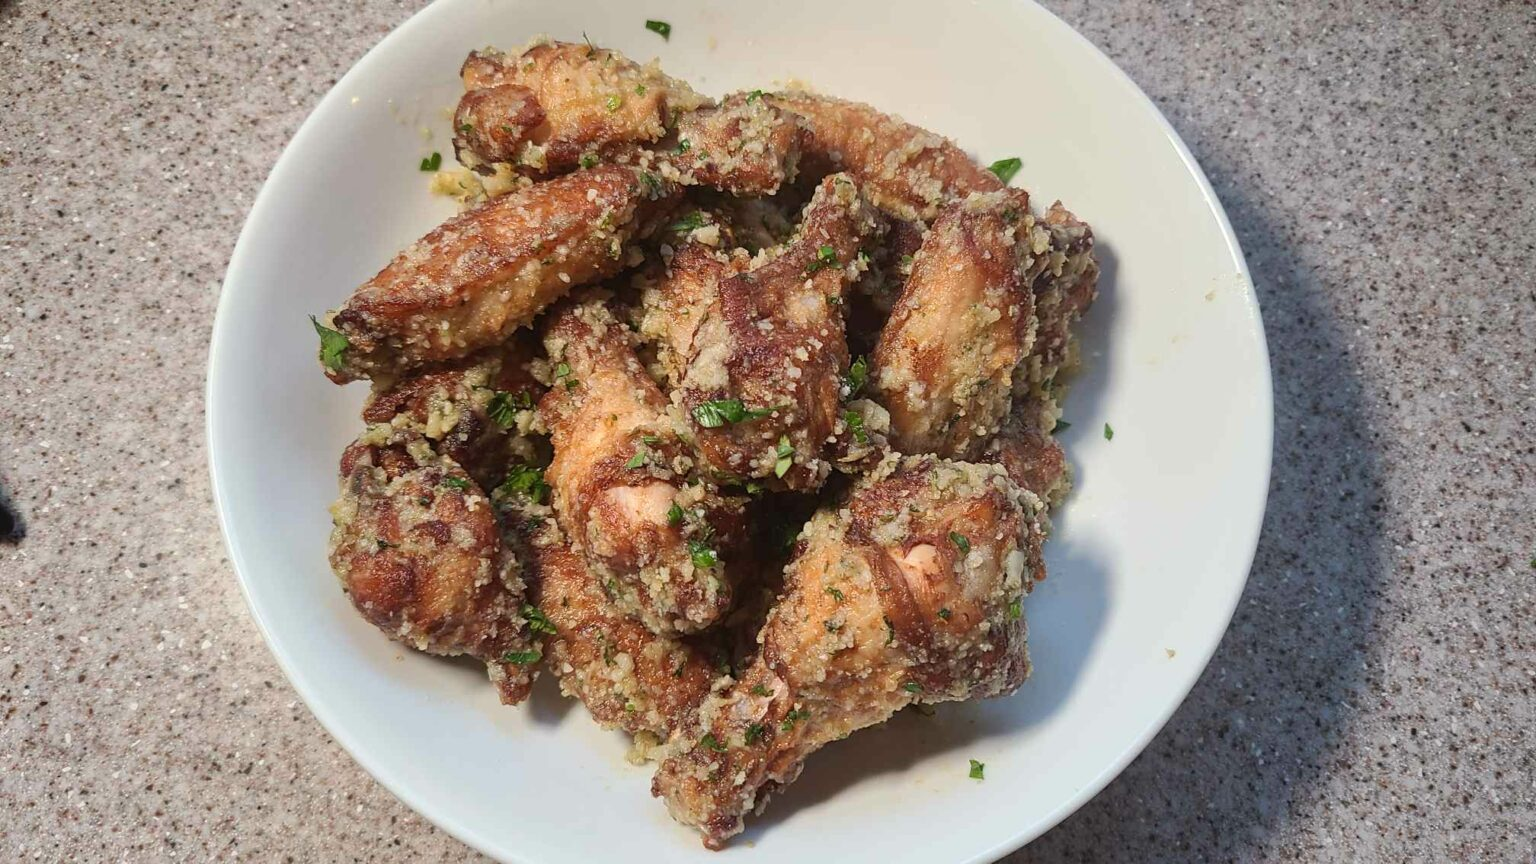 garlic parmesan wings